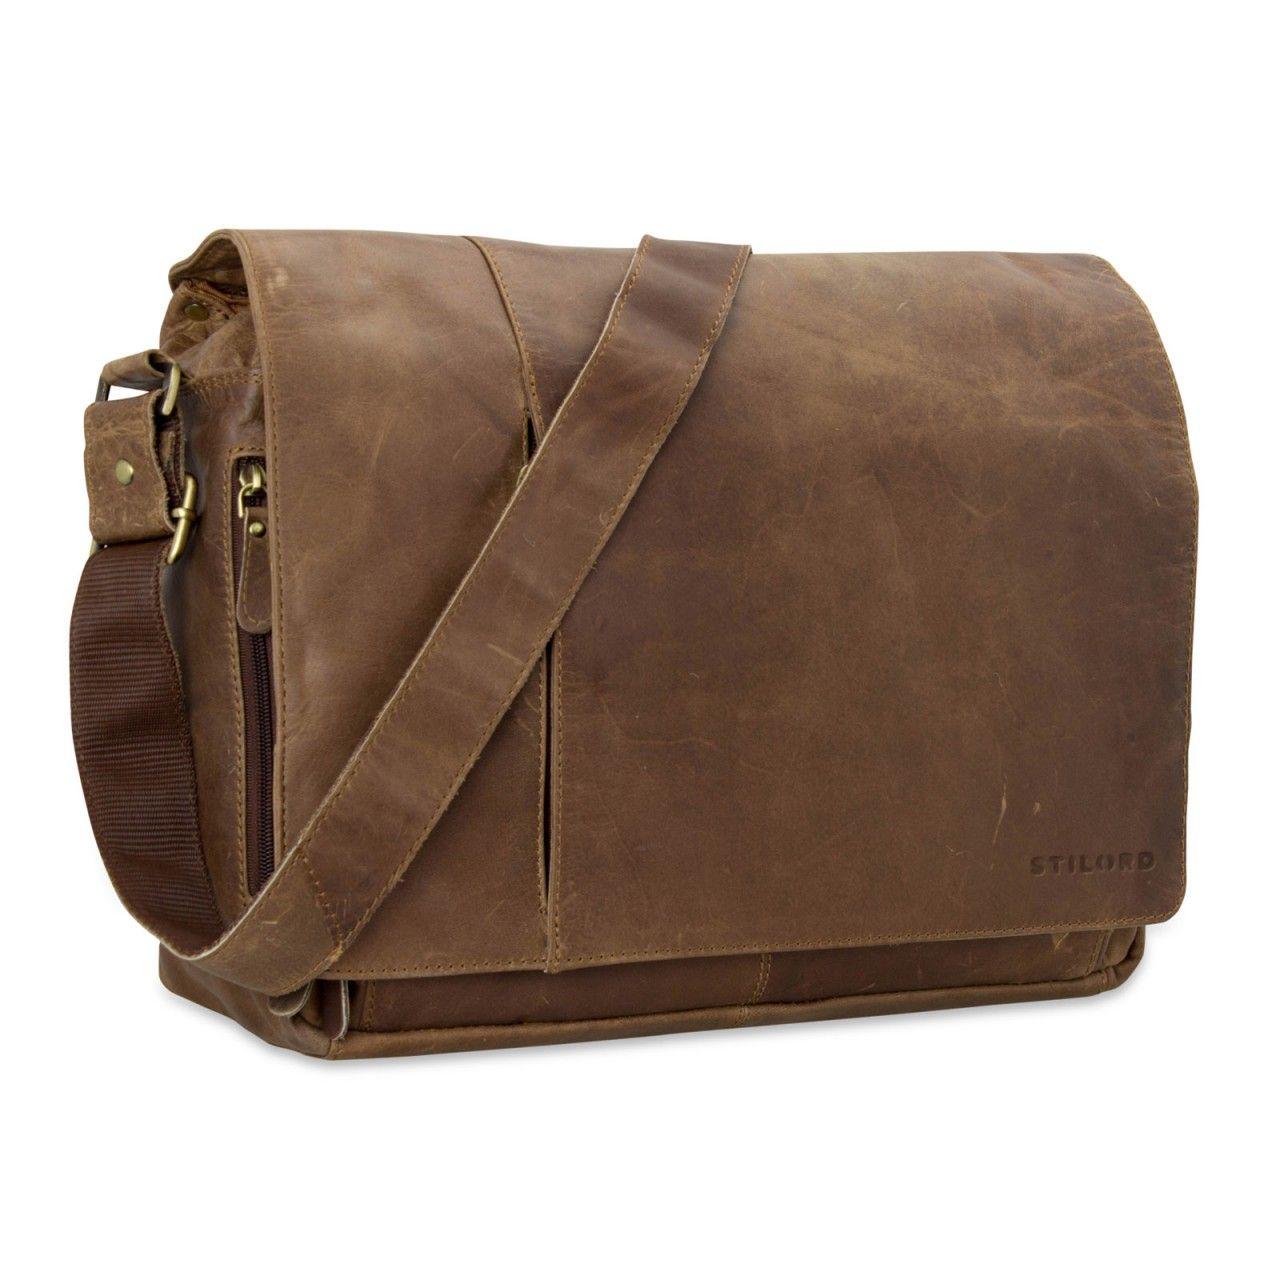 25 best ideas about herren umh ngetasche on pinterest orange handtasche k line handtaschen. Black Bedroom Furniture Sets. Home Design Ideas